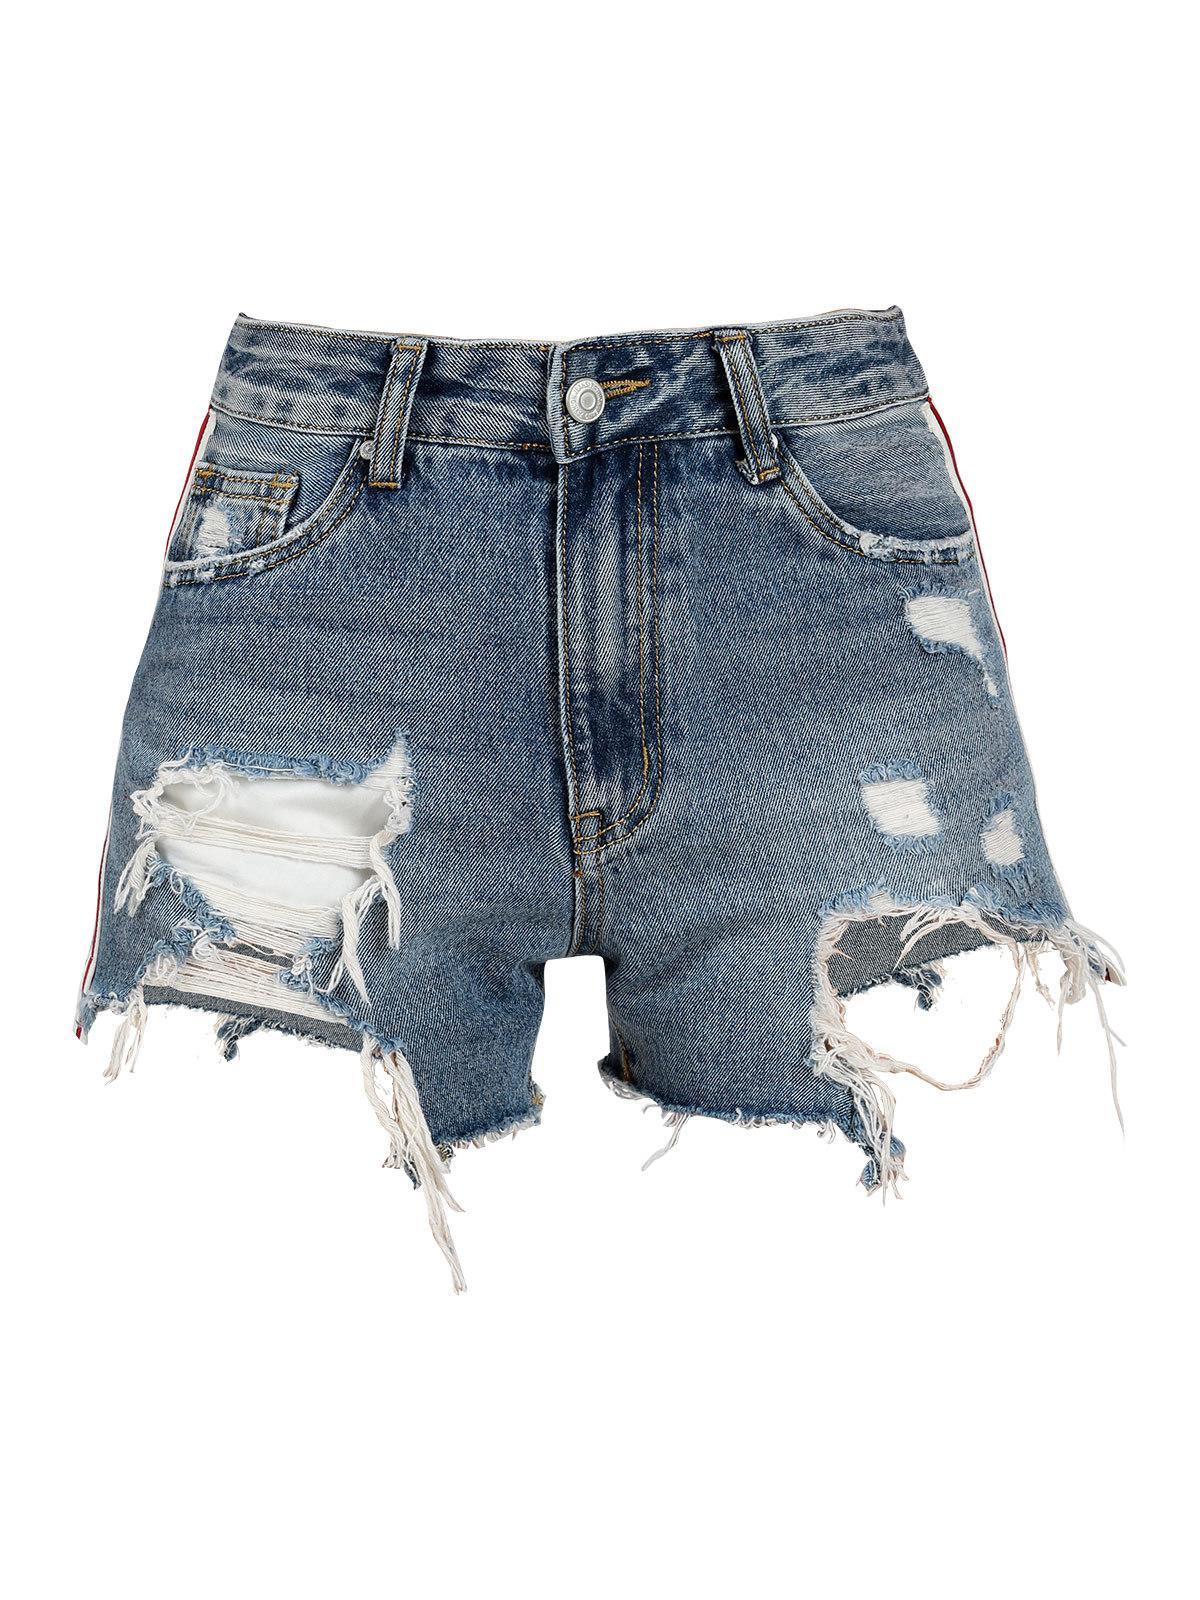 pantaloni adidas a strisce